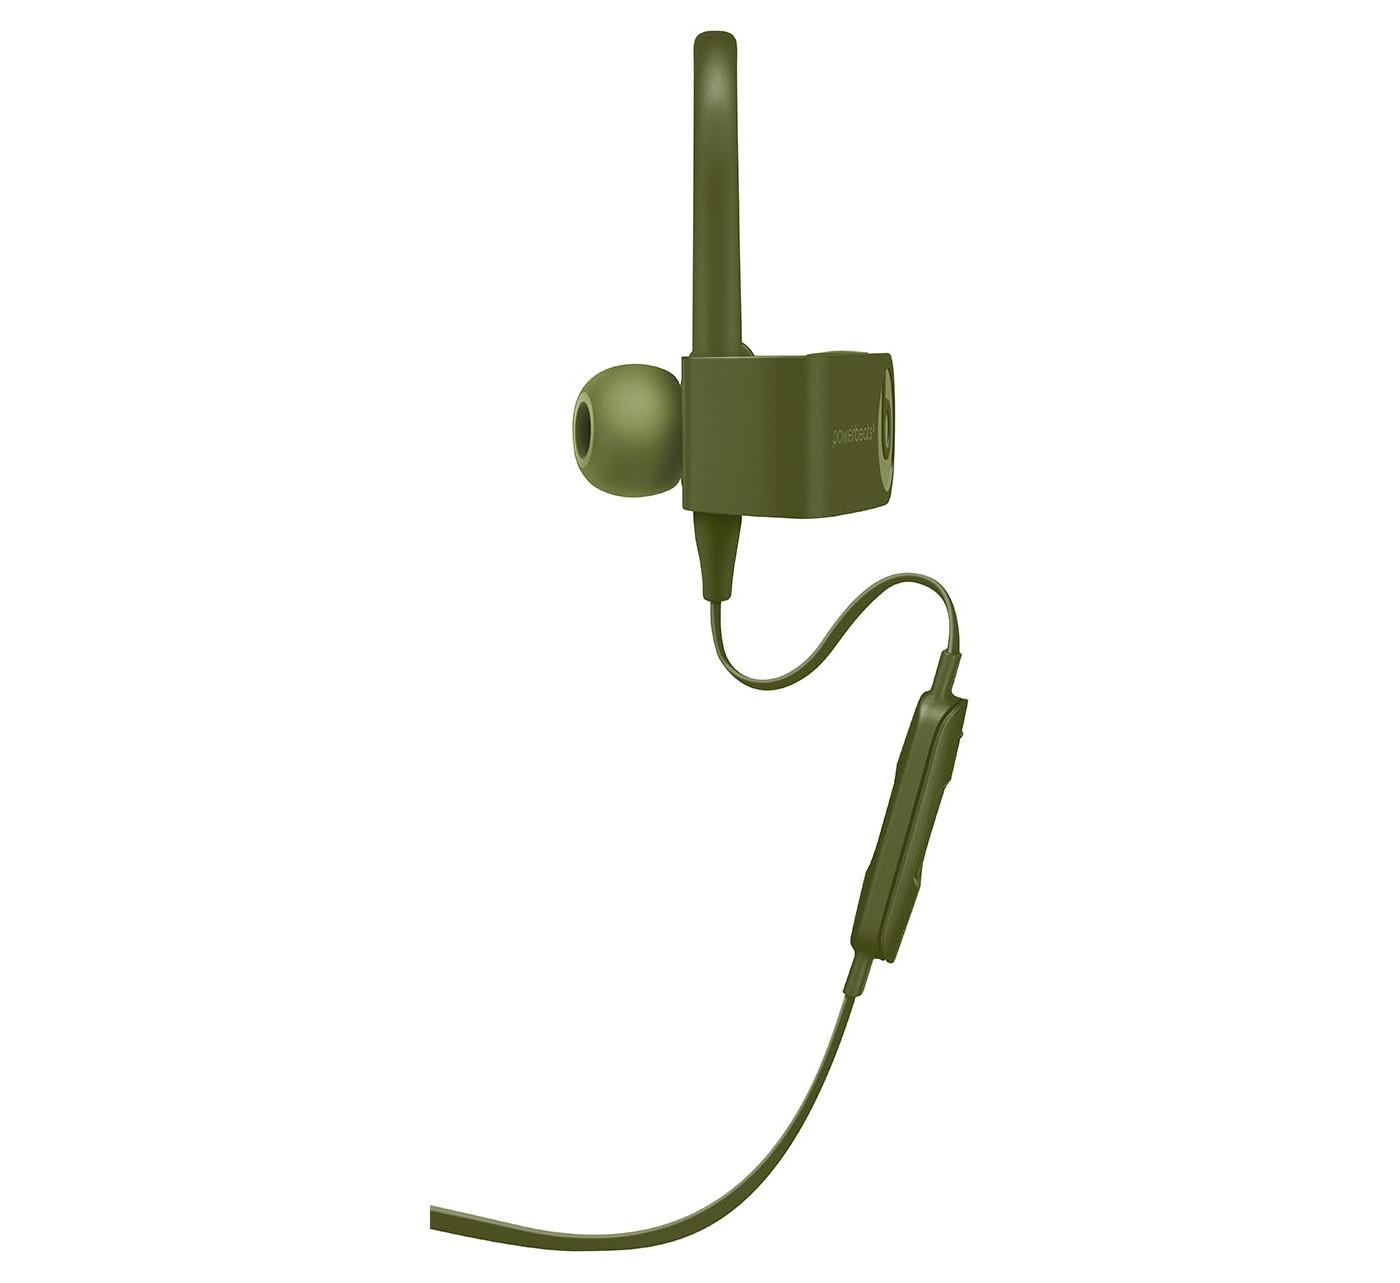 4d2768e8455 Beats-Powerbeats3-Wireless-Earphones-Neighborhood-Collection thumbnail 40